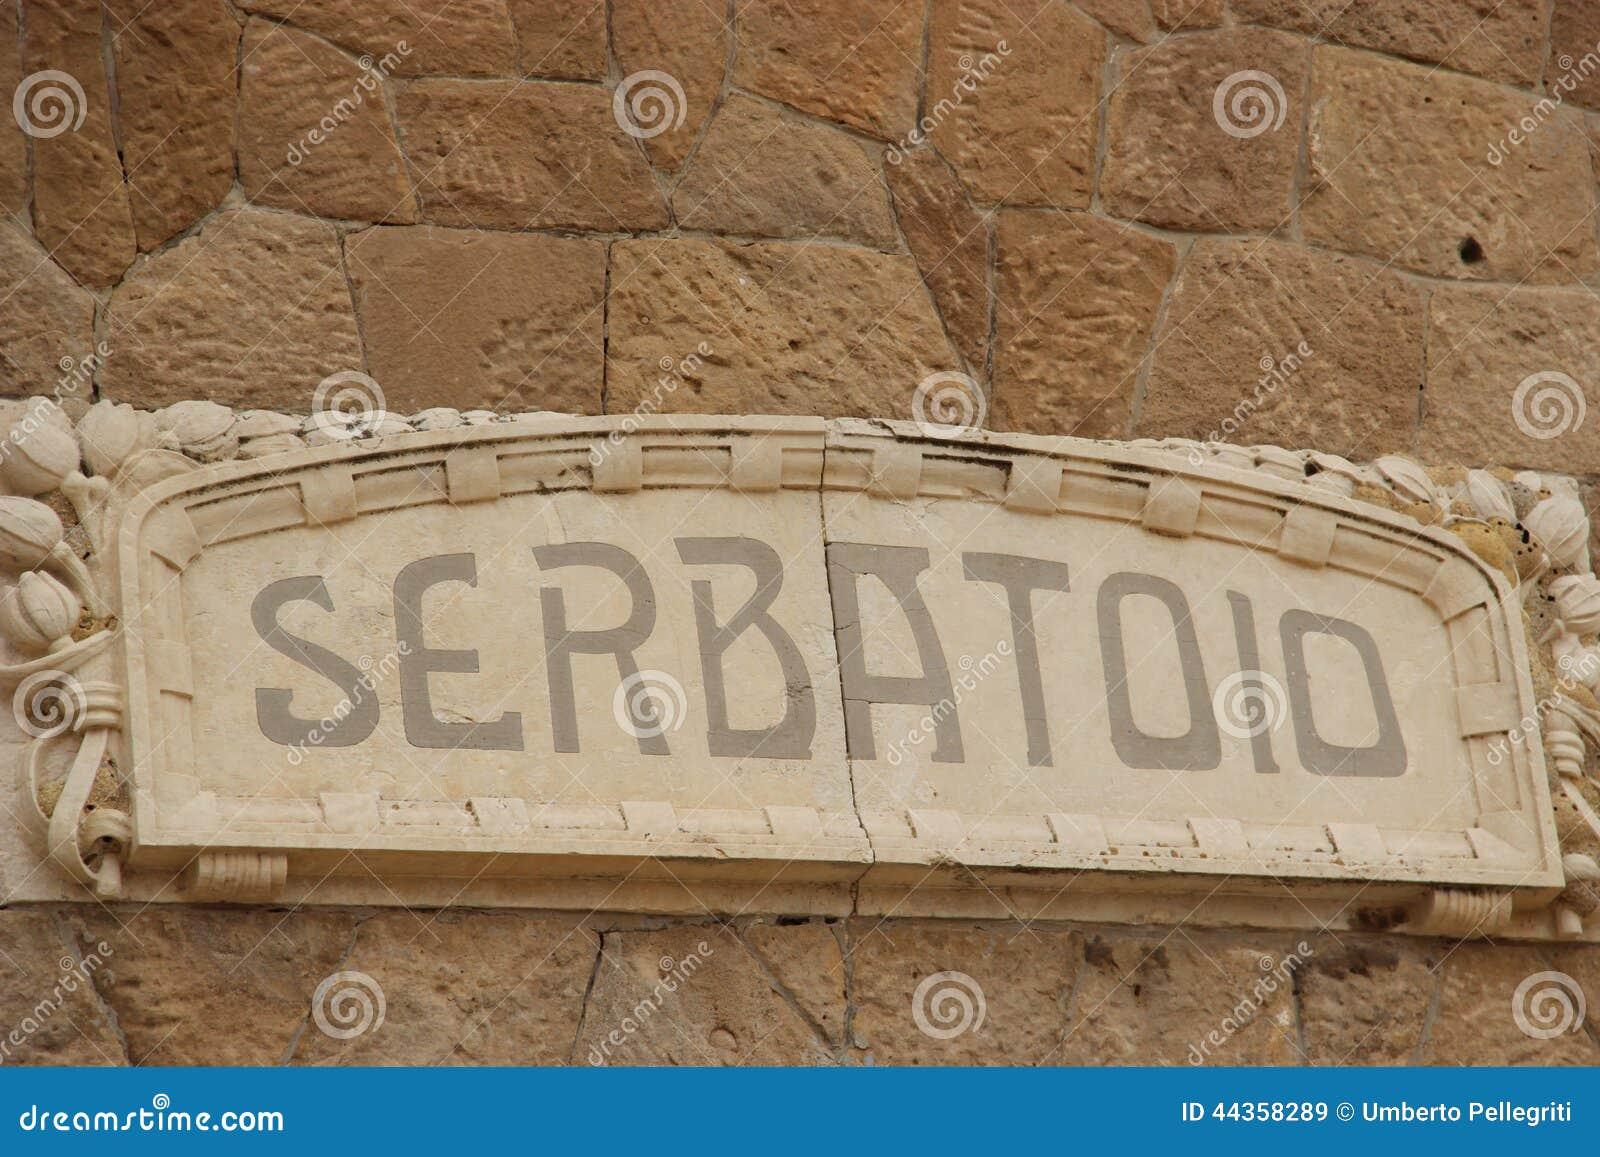 Serbatoio